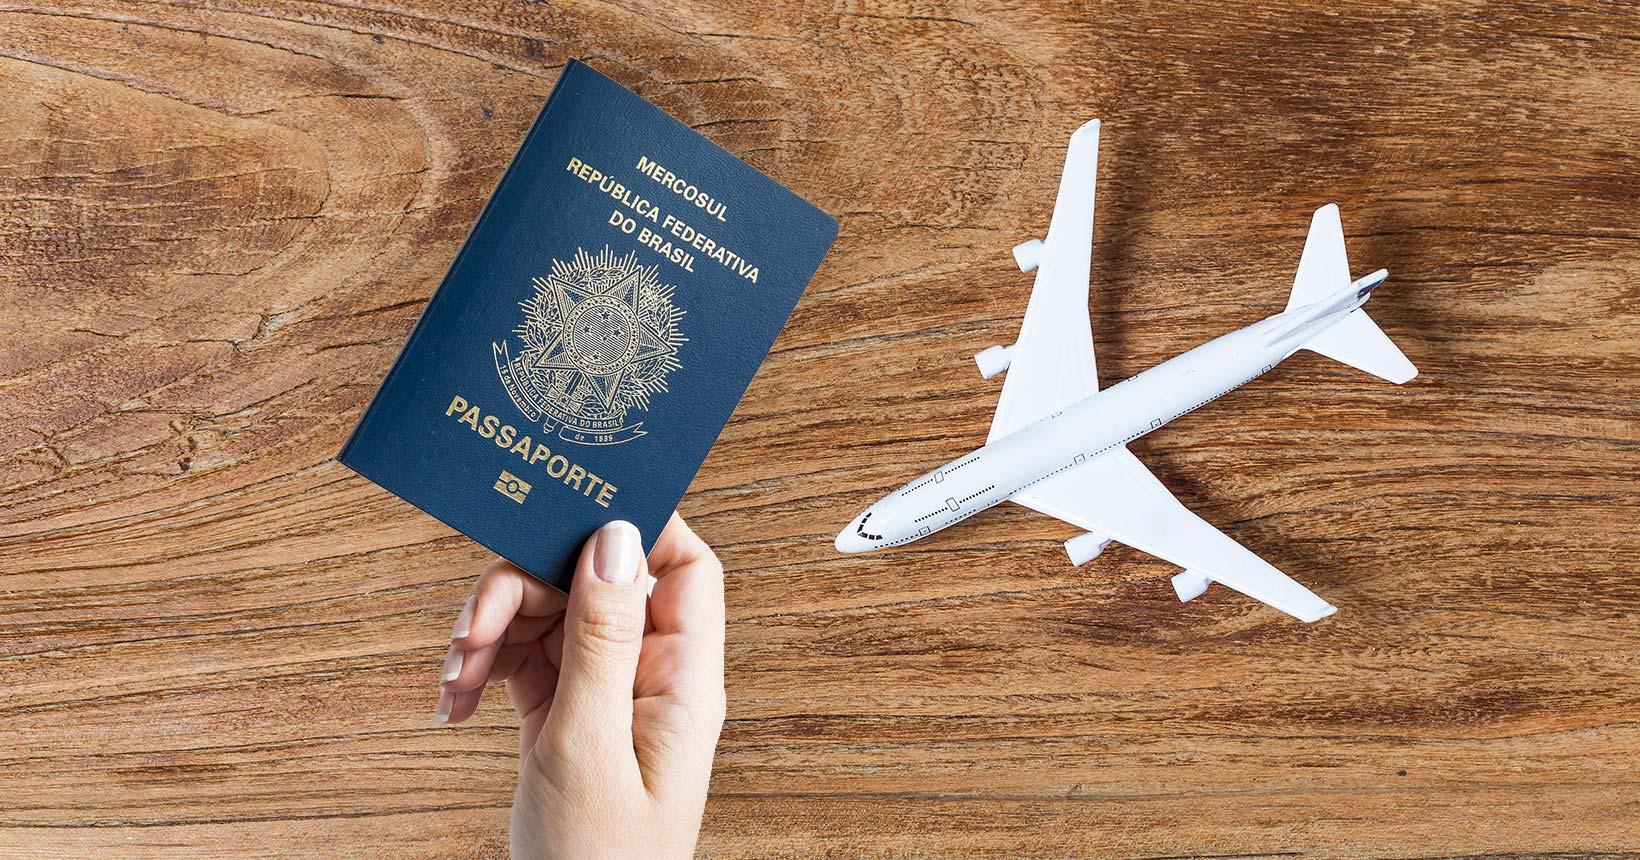 Brasileiros podem viajar para os Estados Unidos durante a pandemia